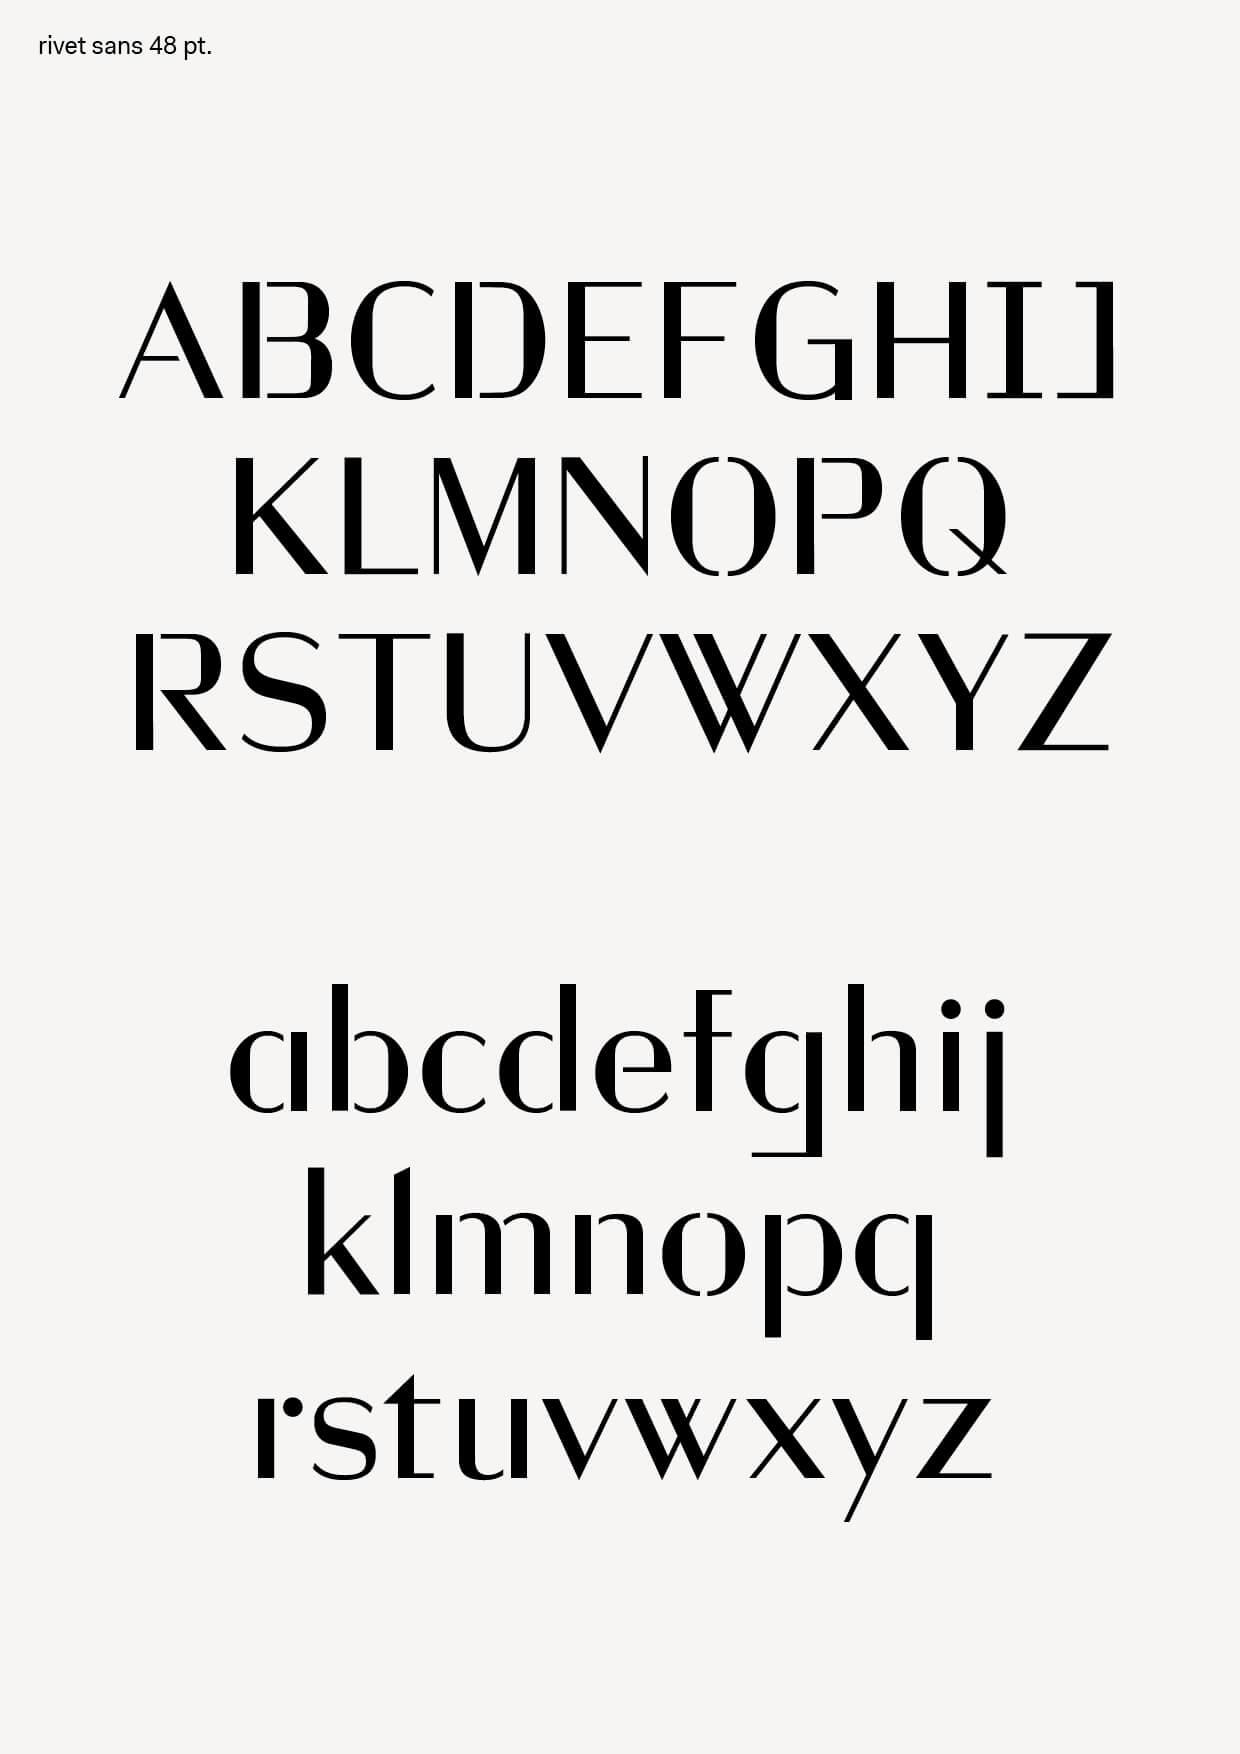 rivet-sans-specimen-alphabet